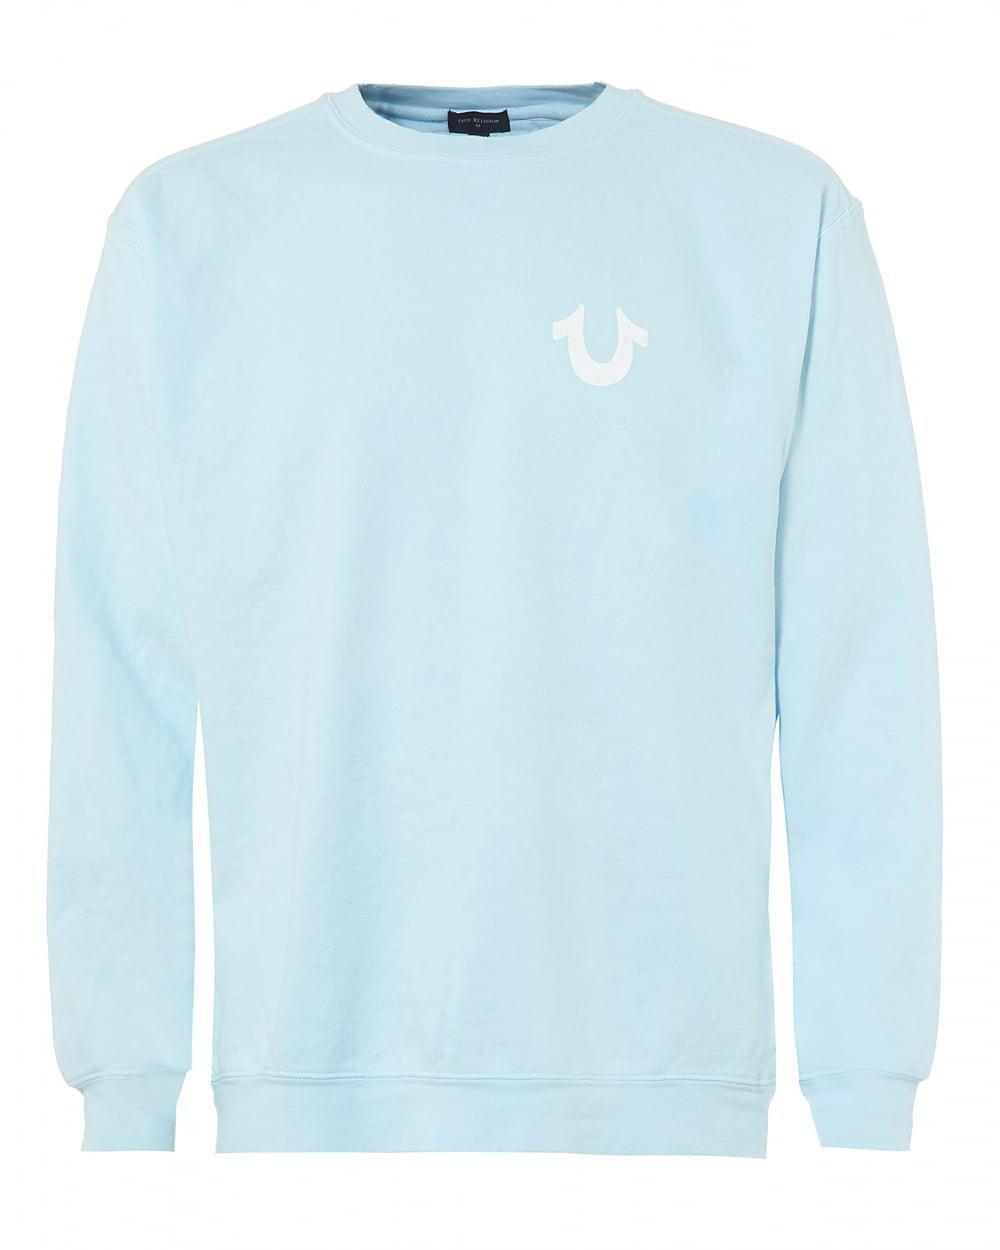 1000x1250 True Religion Sky Blue Sweatshirt, White Horseshoe Logo Graphic